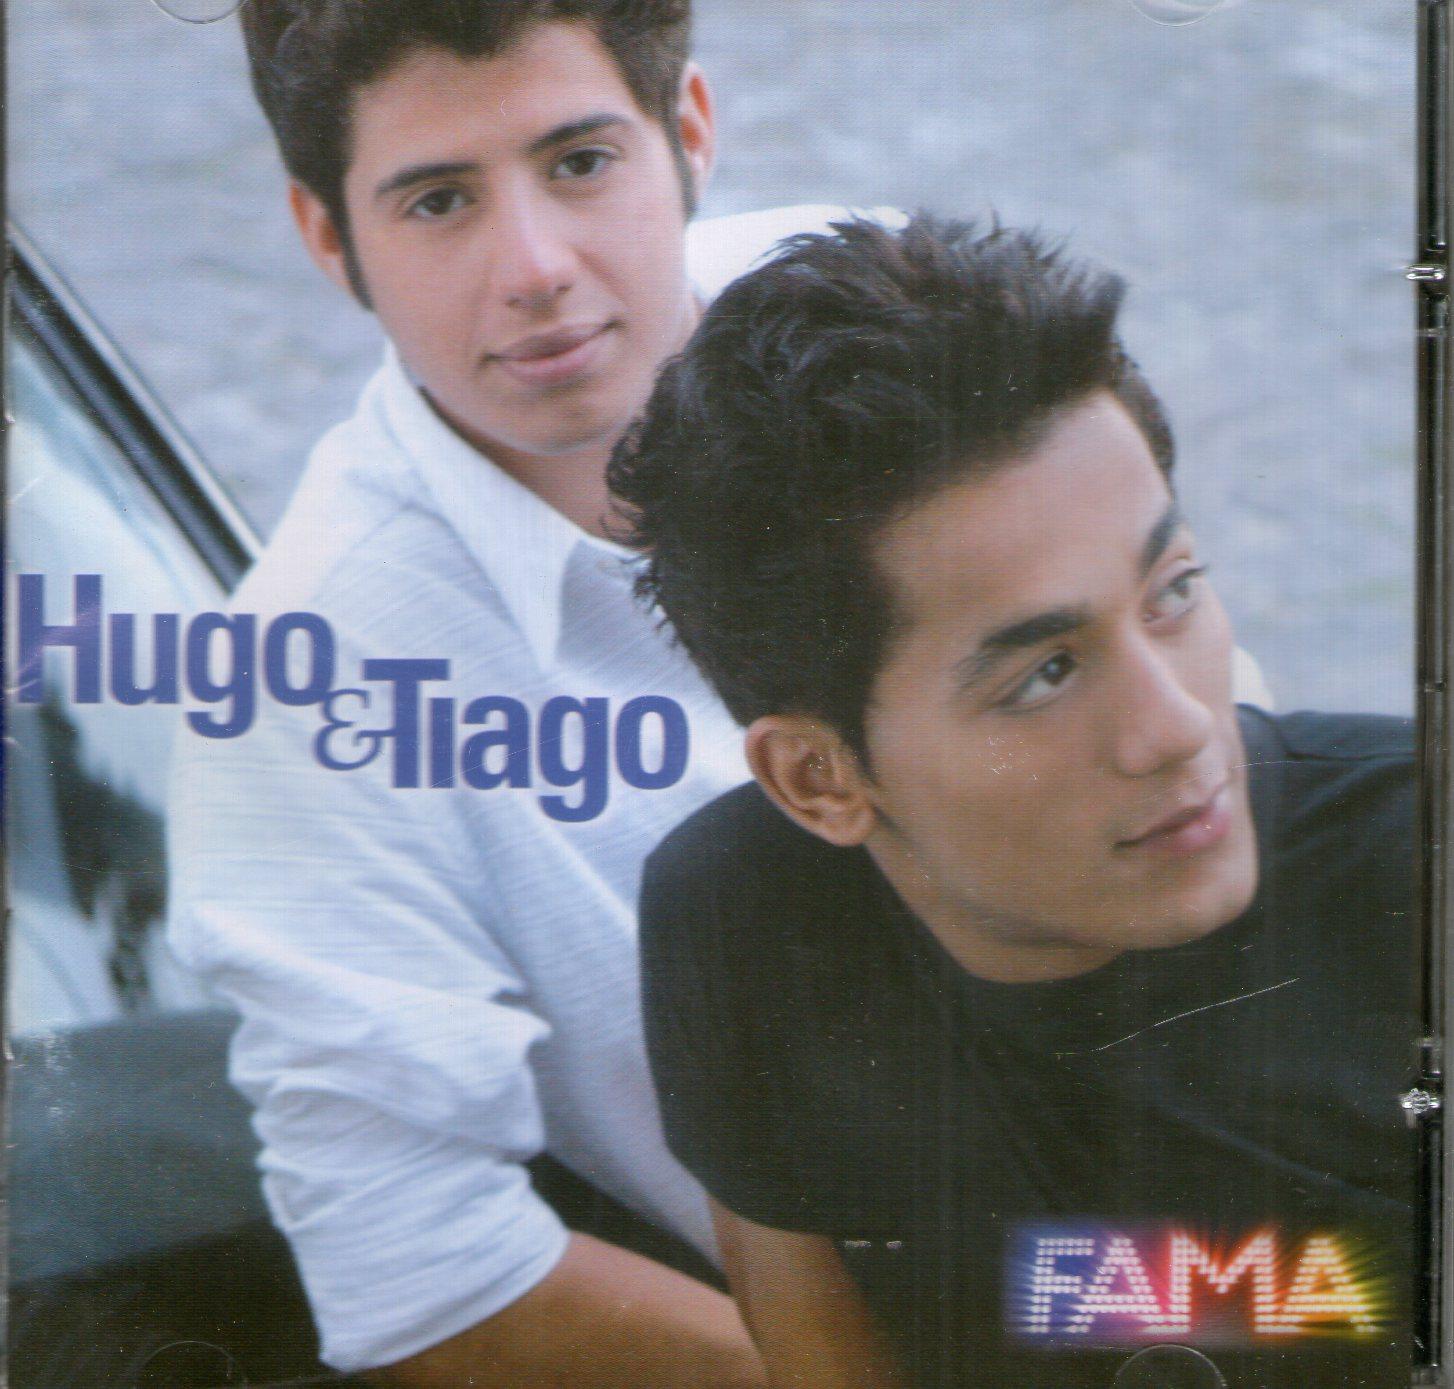 Hugo e Tiago - Fama - Cd Nacional  - Billbox Records